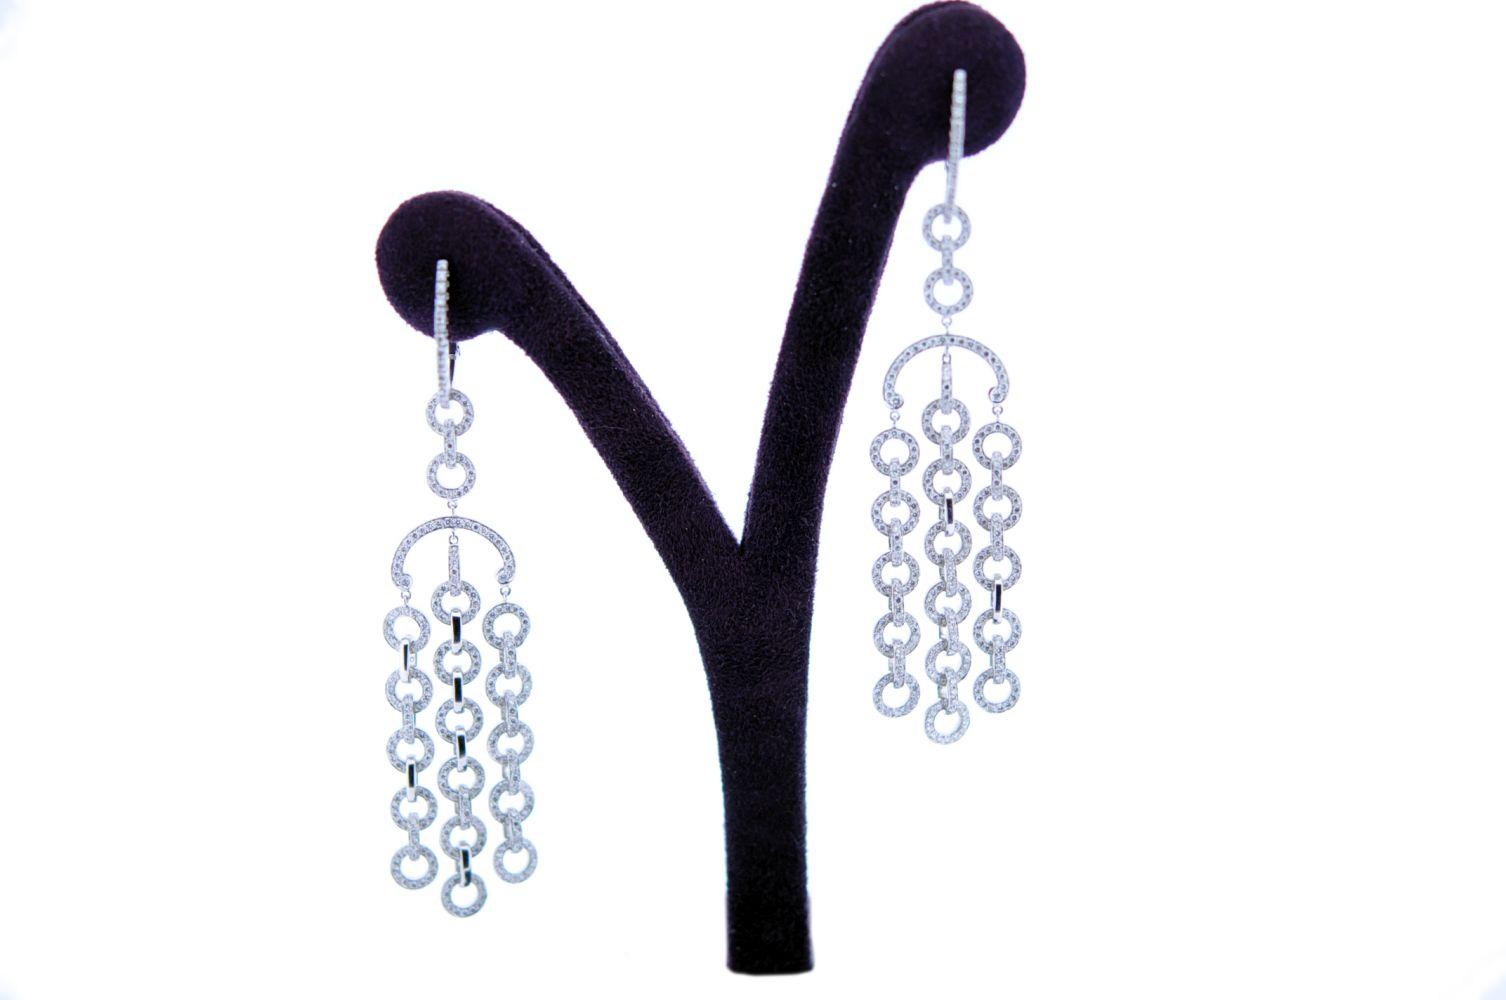 #29 Diamond Eardrops | Diamantohrgehänge Image